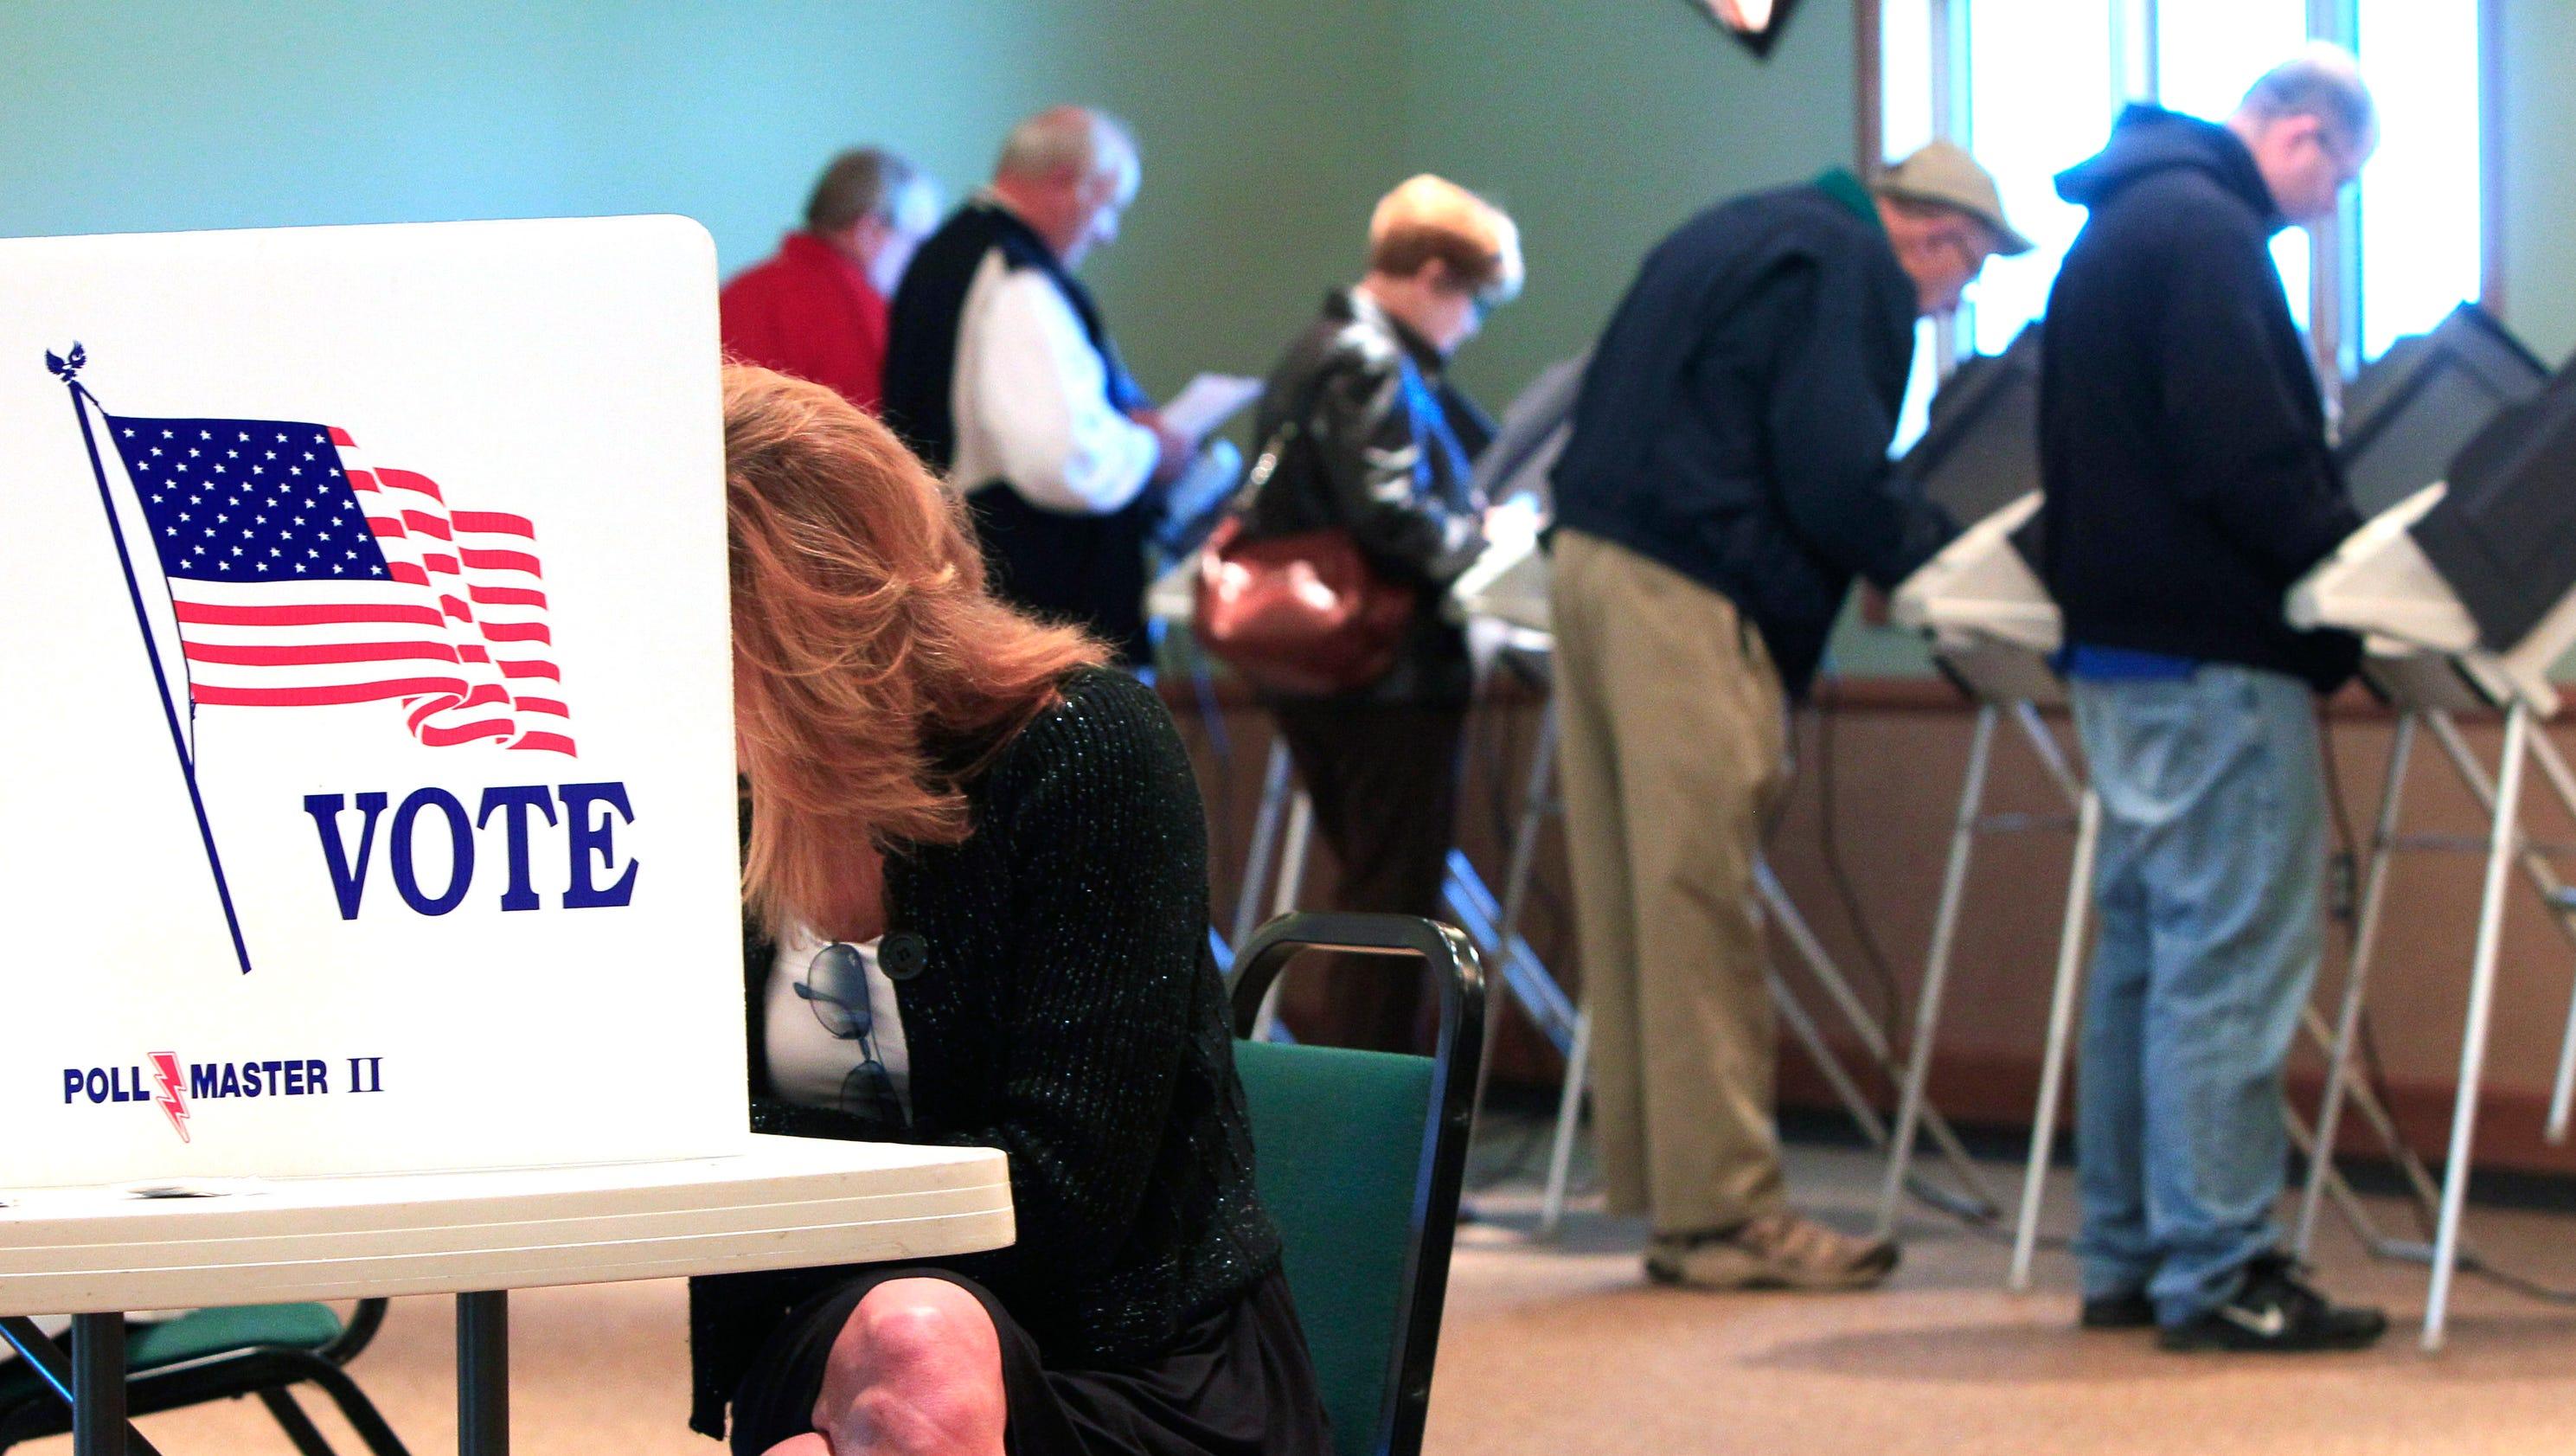 where to vote - photo #33